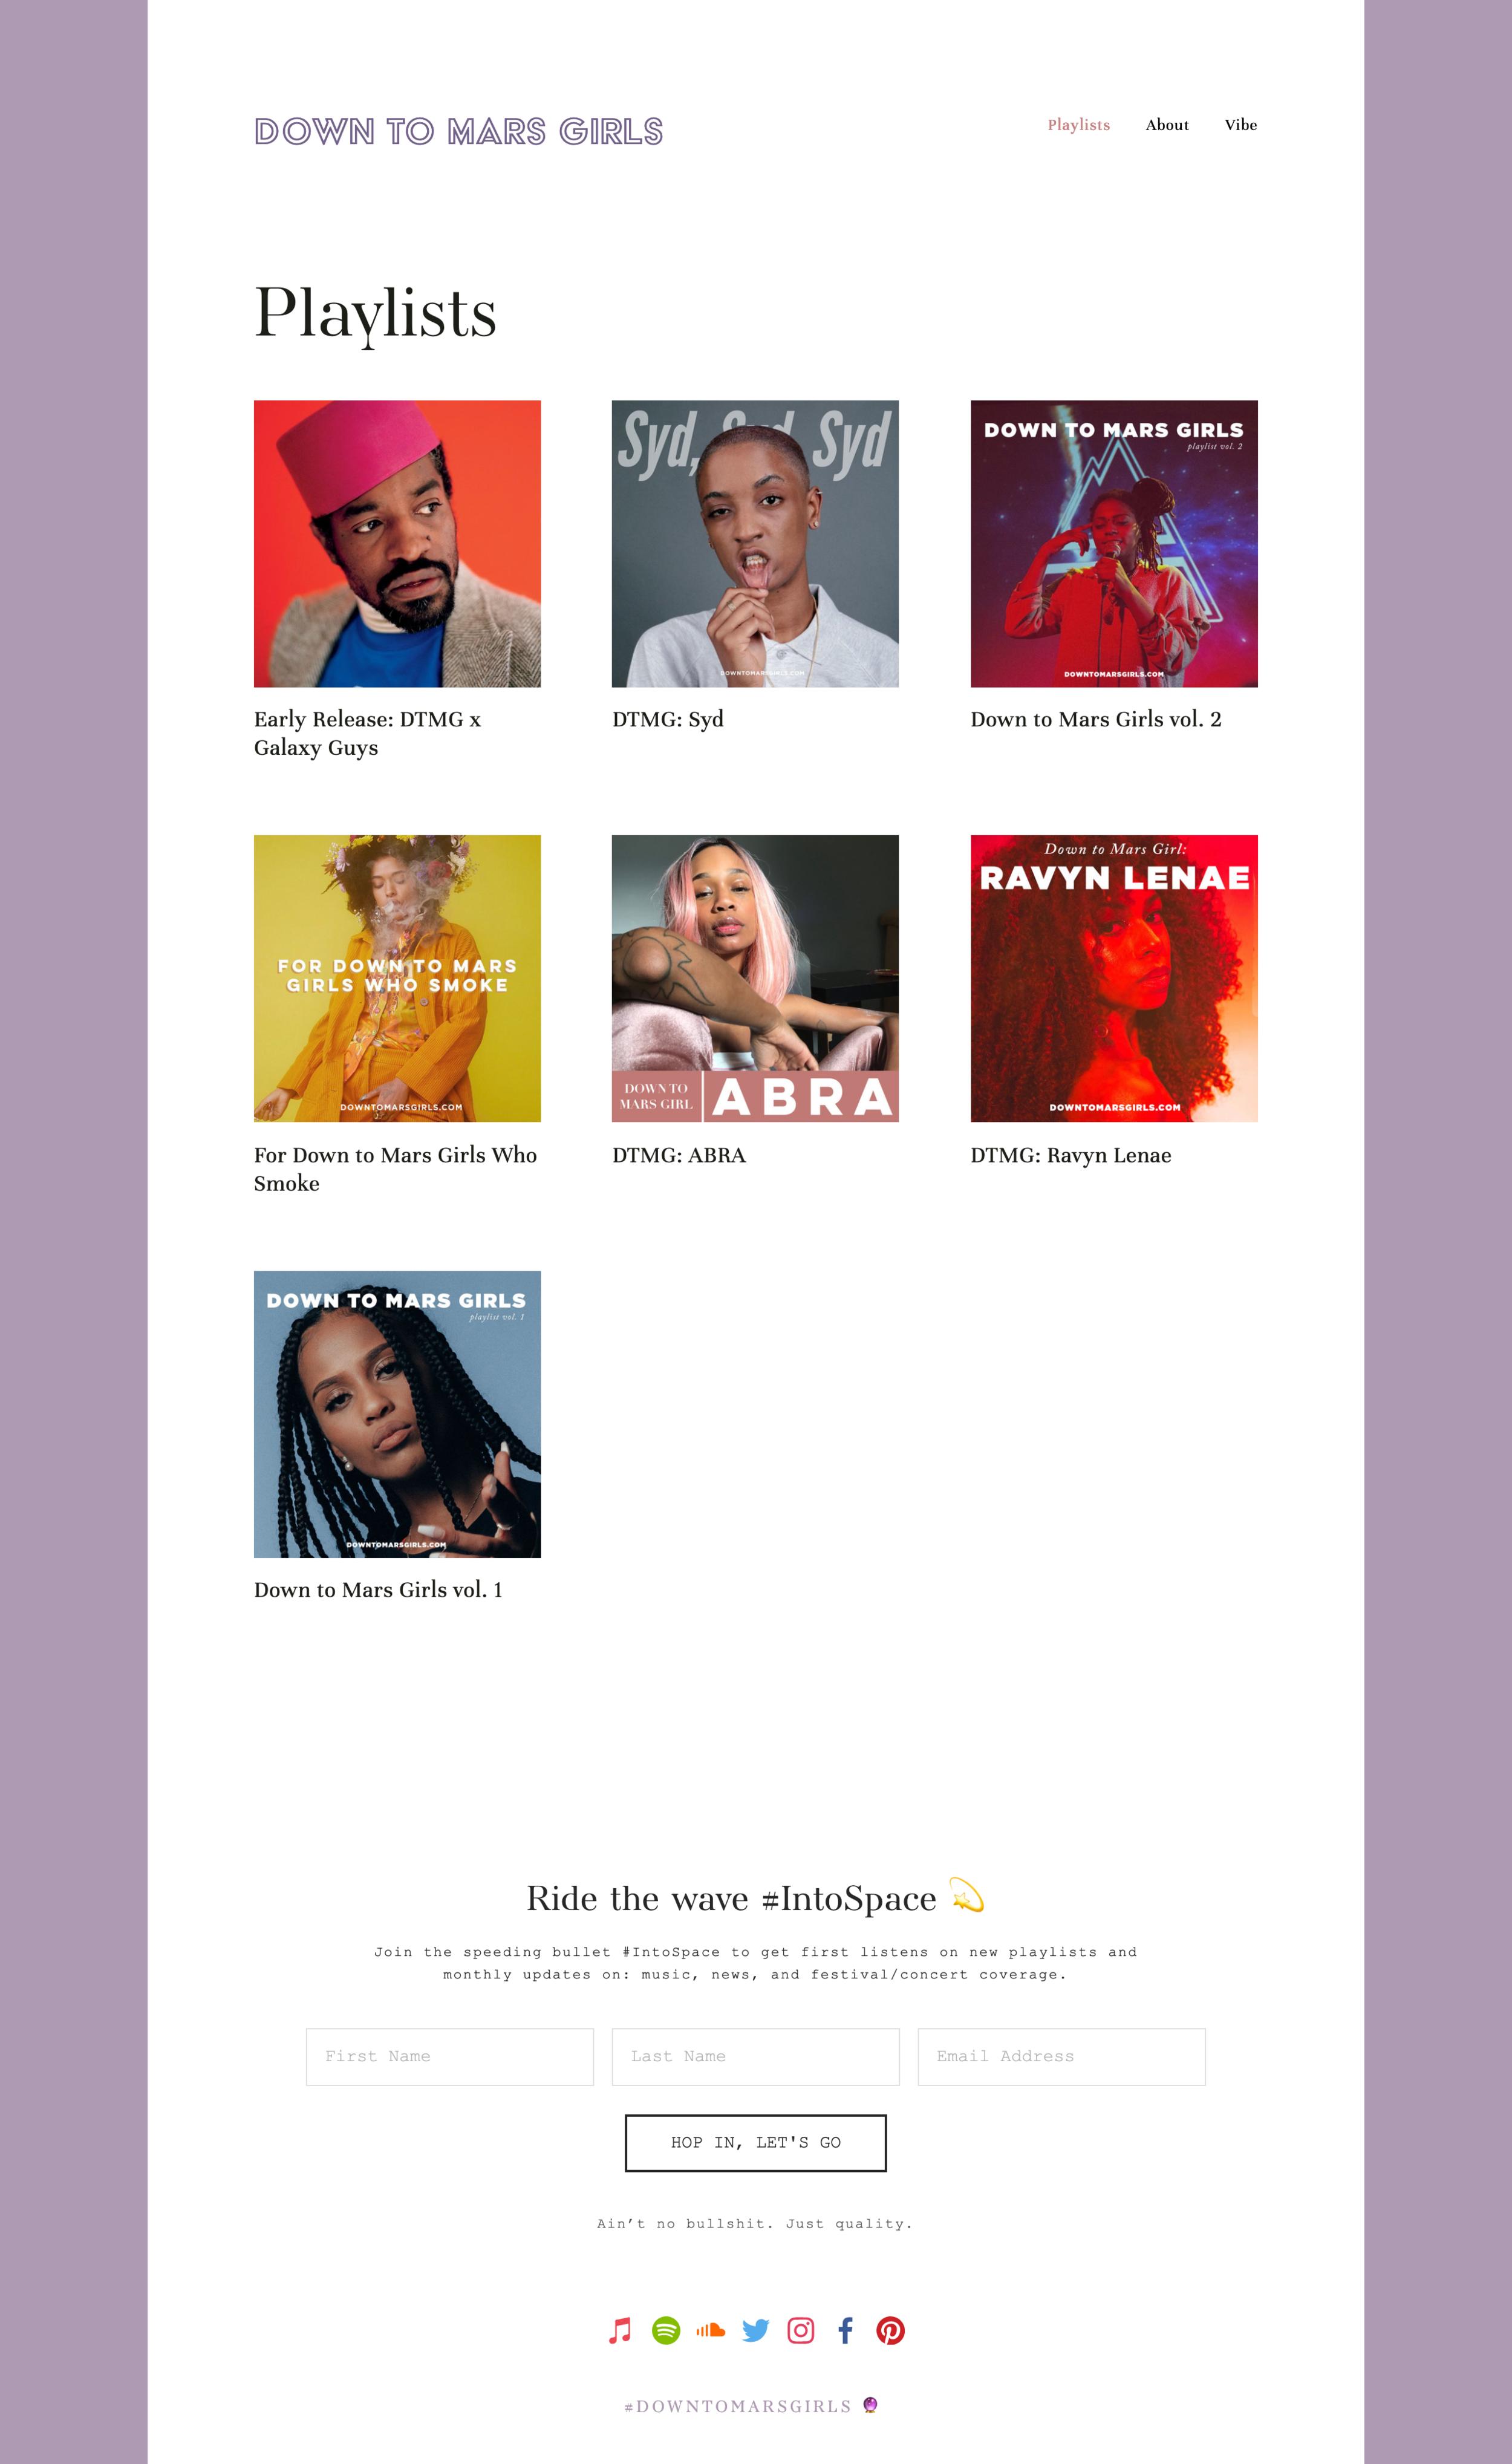 screencapture-downtomarsgirls-playlists-2019-02-12-19_39_04.png